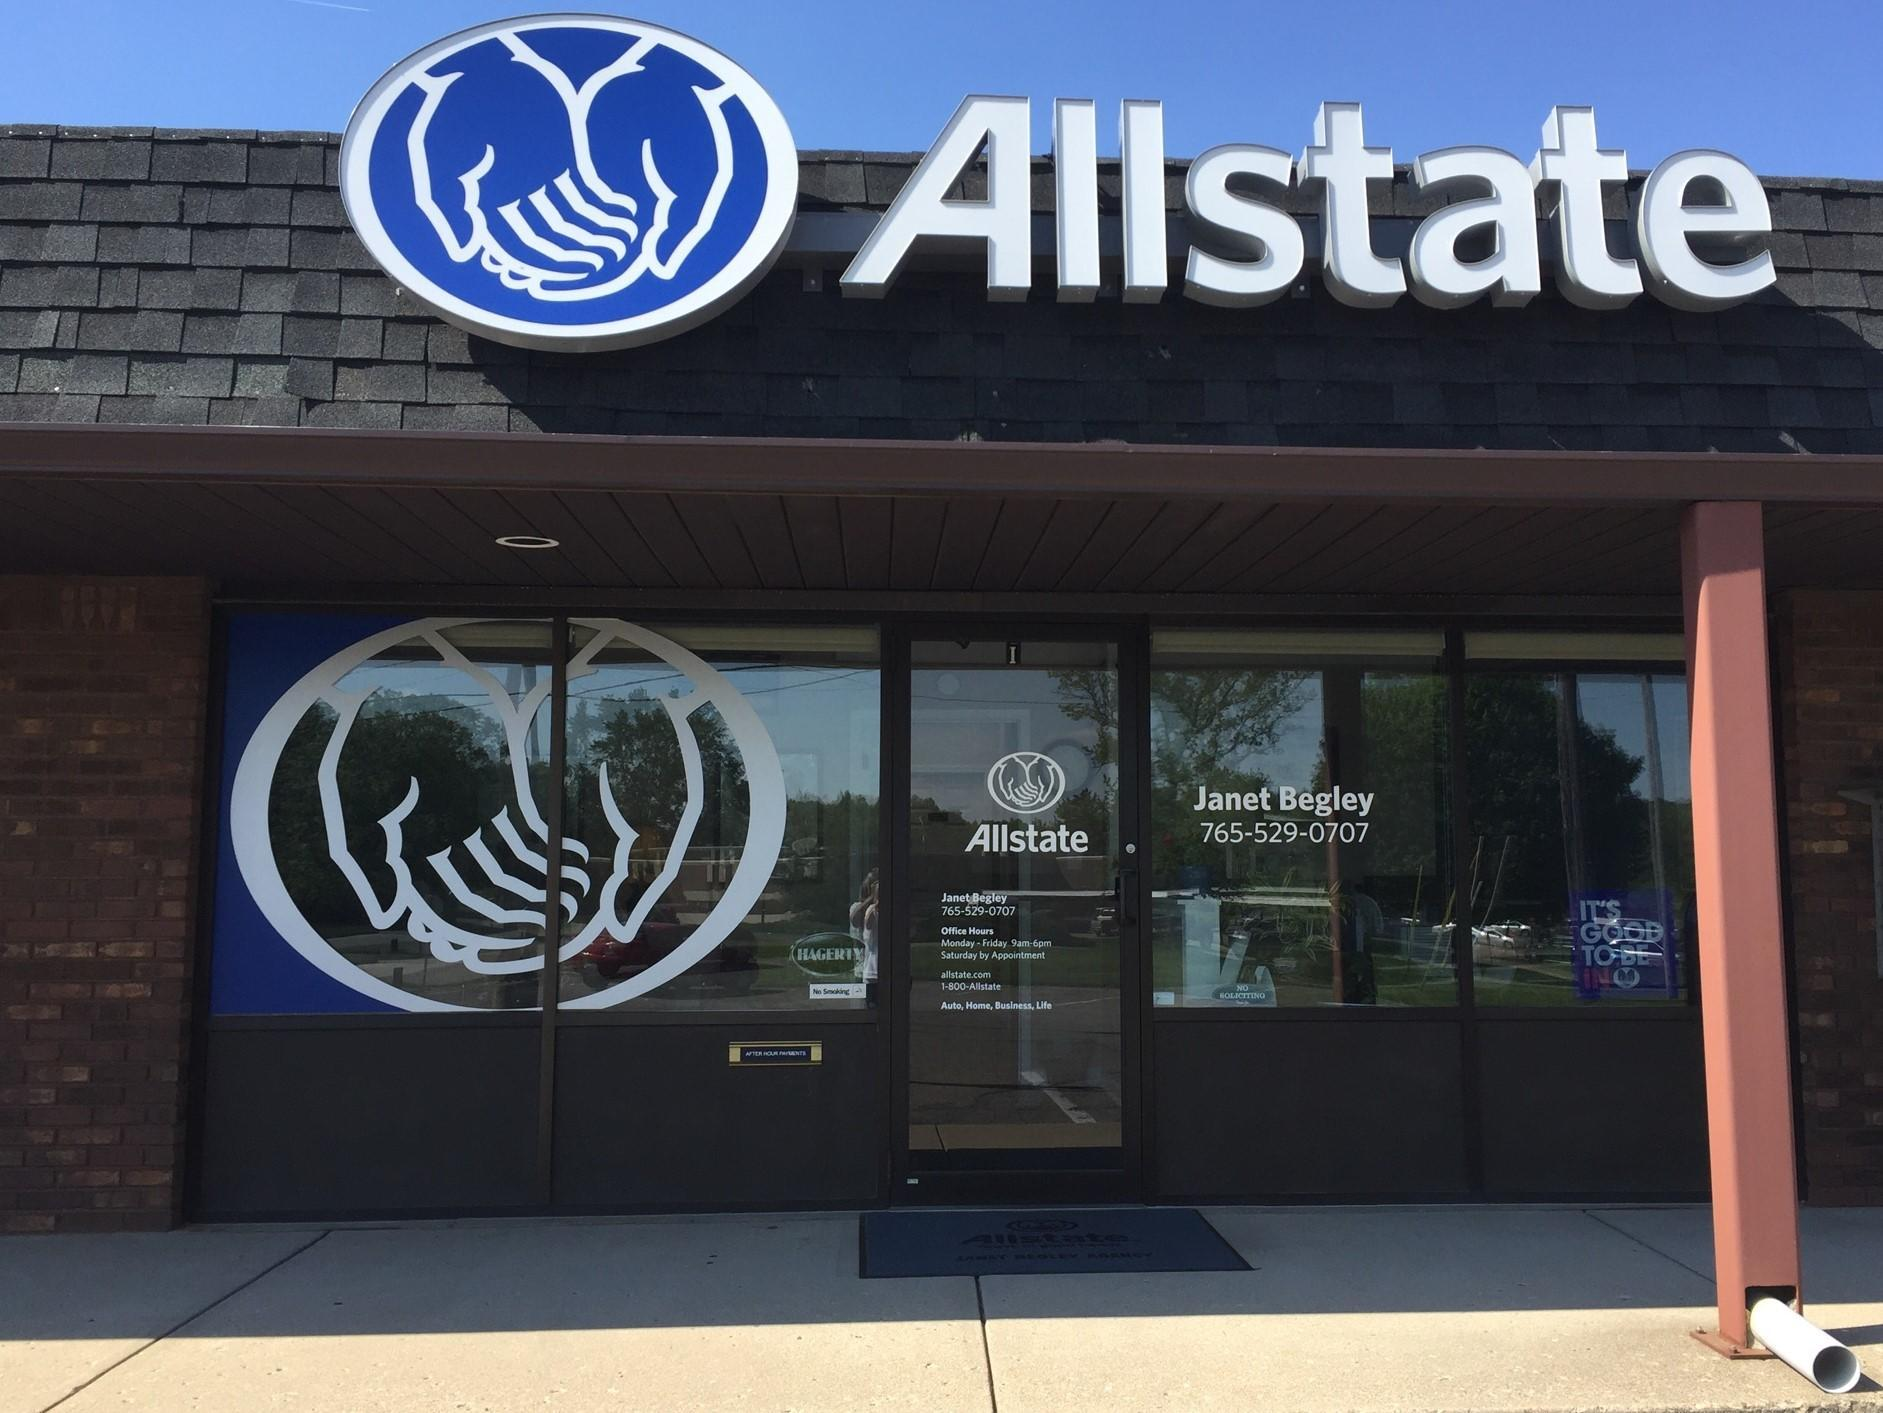 Janet Begley: Allstate Insurance image 2